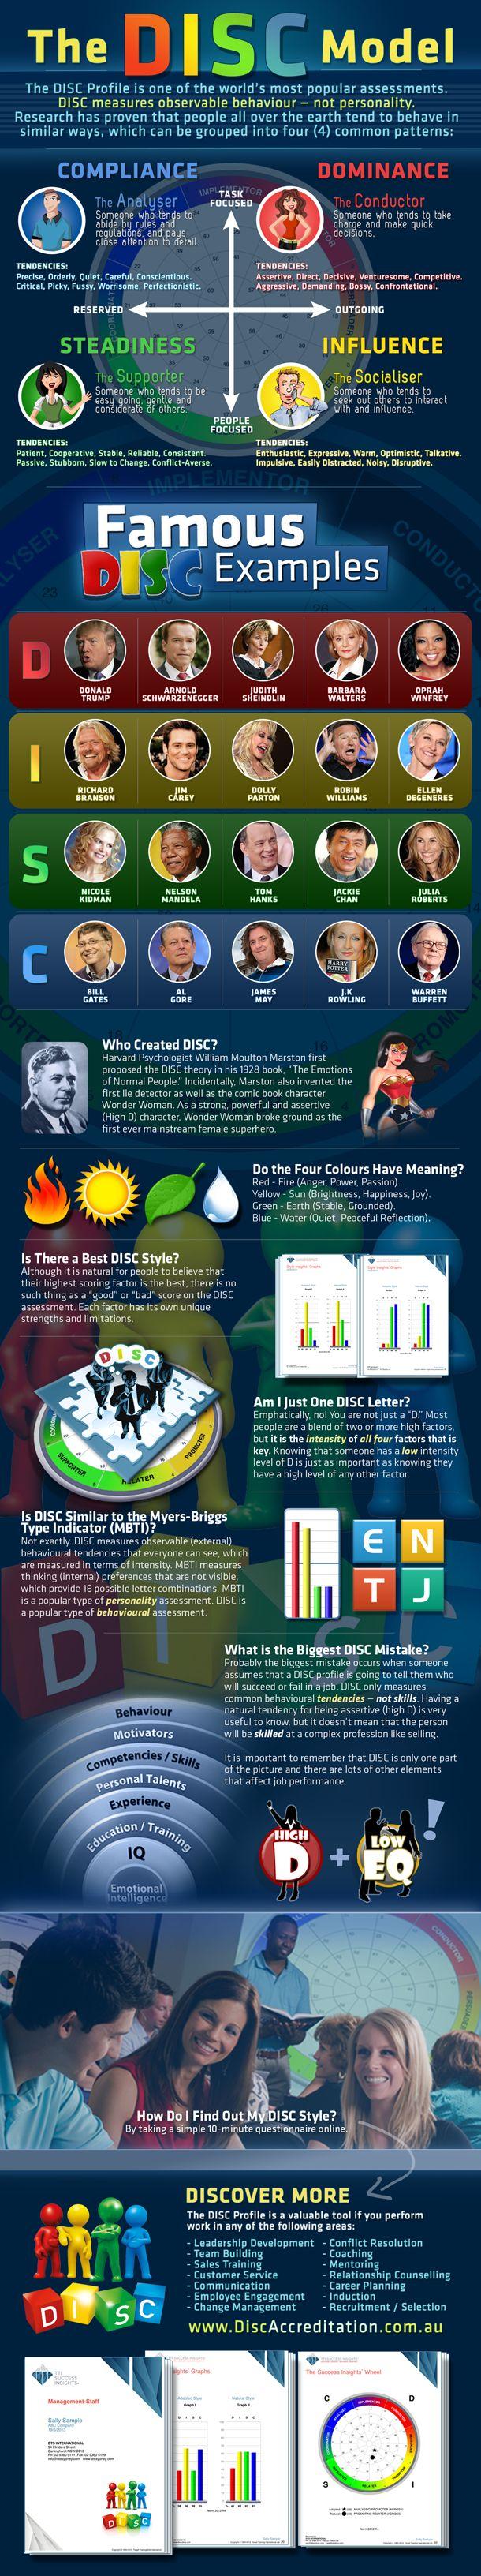 DISC infographic - DTS International (valuable tool for leadership development, team building, career planning, communication, recruitment/selection) #assessments #ttisi